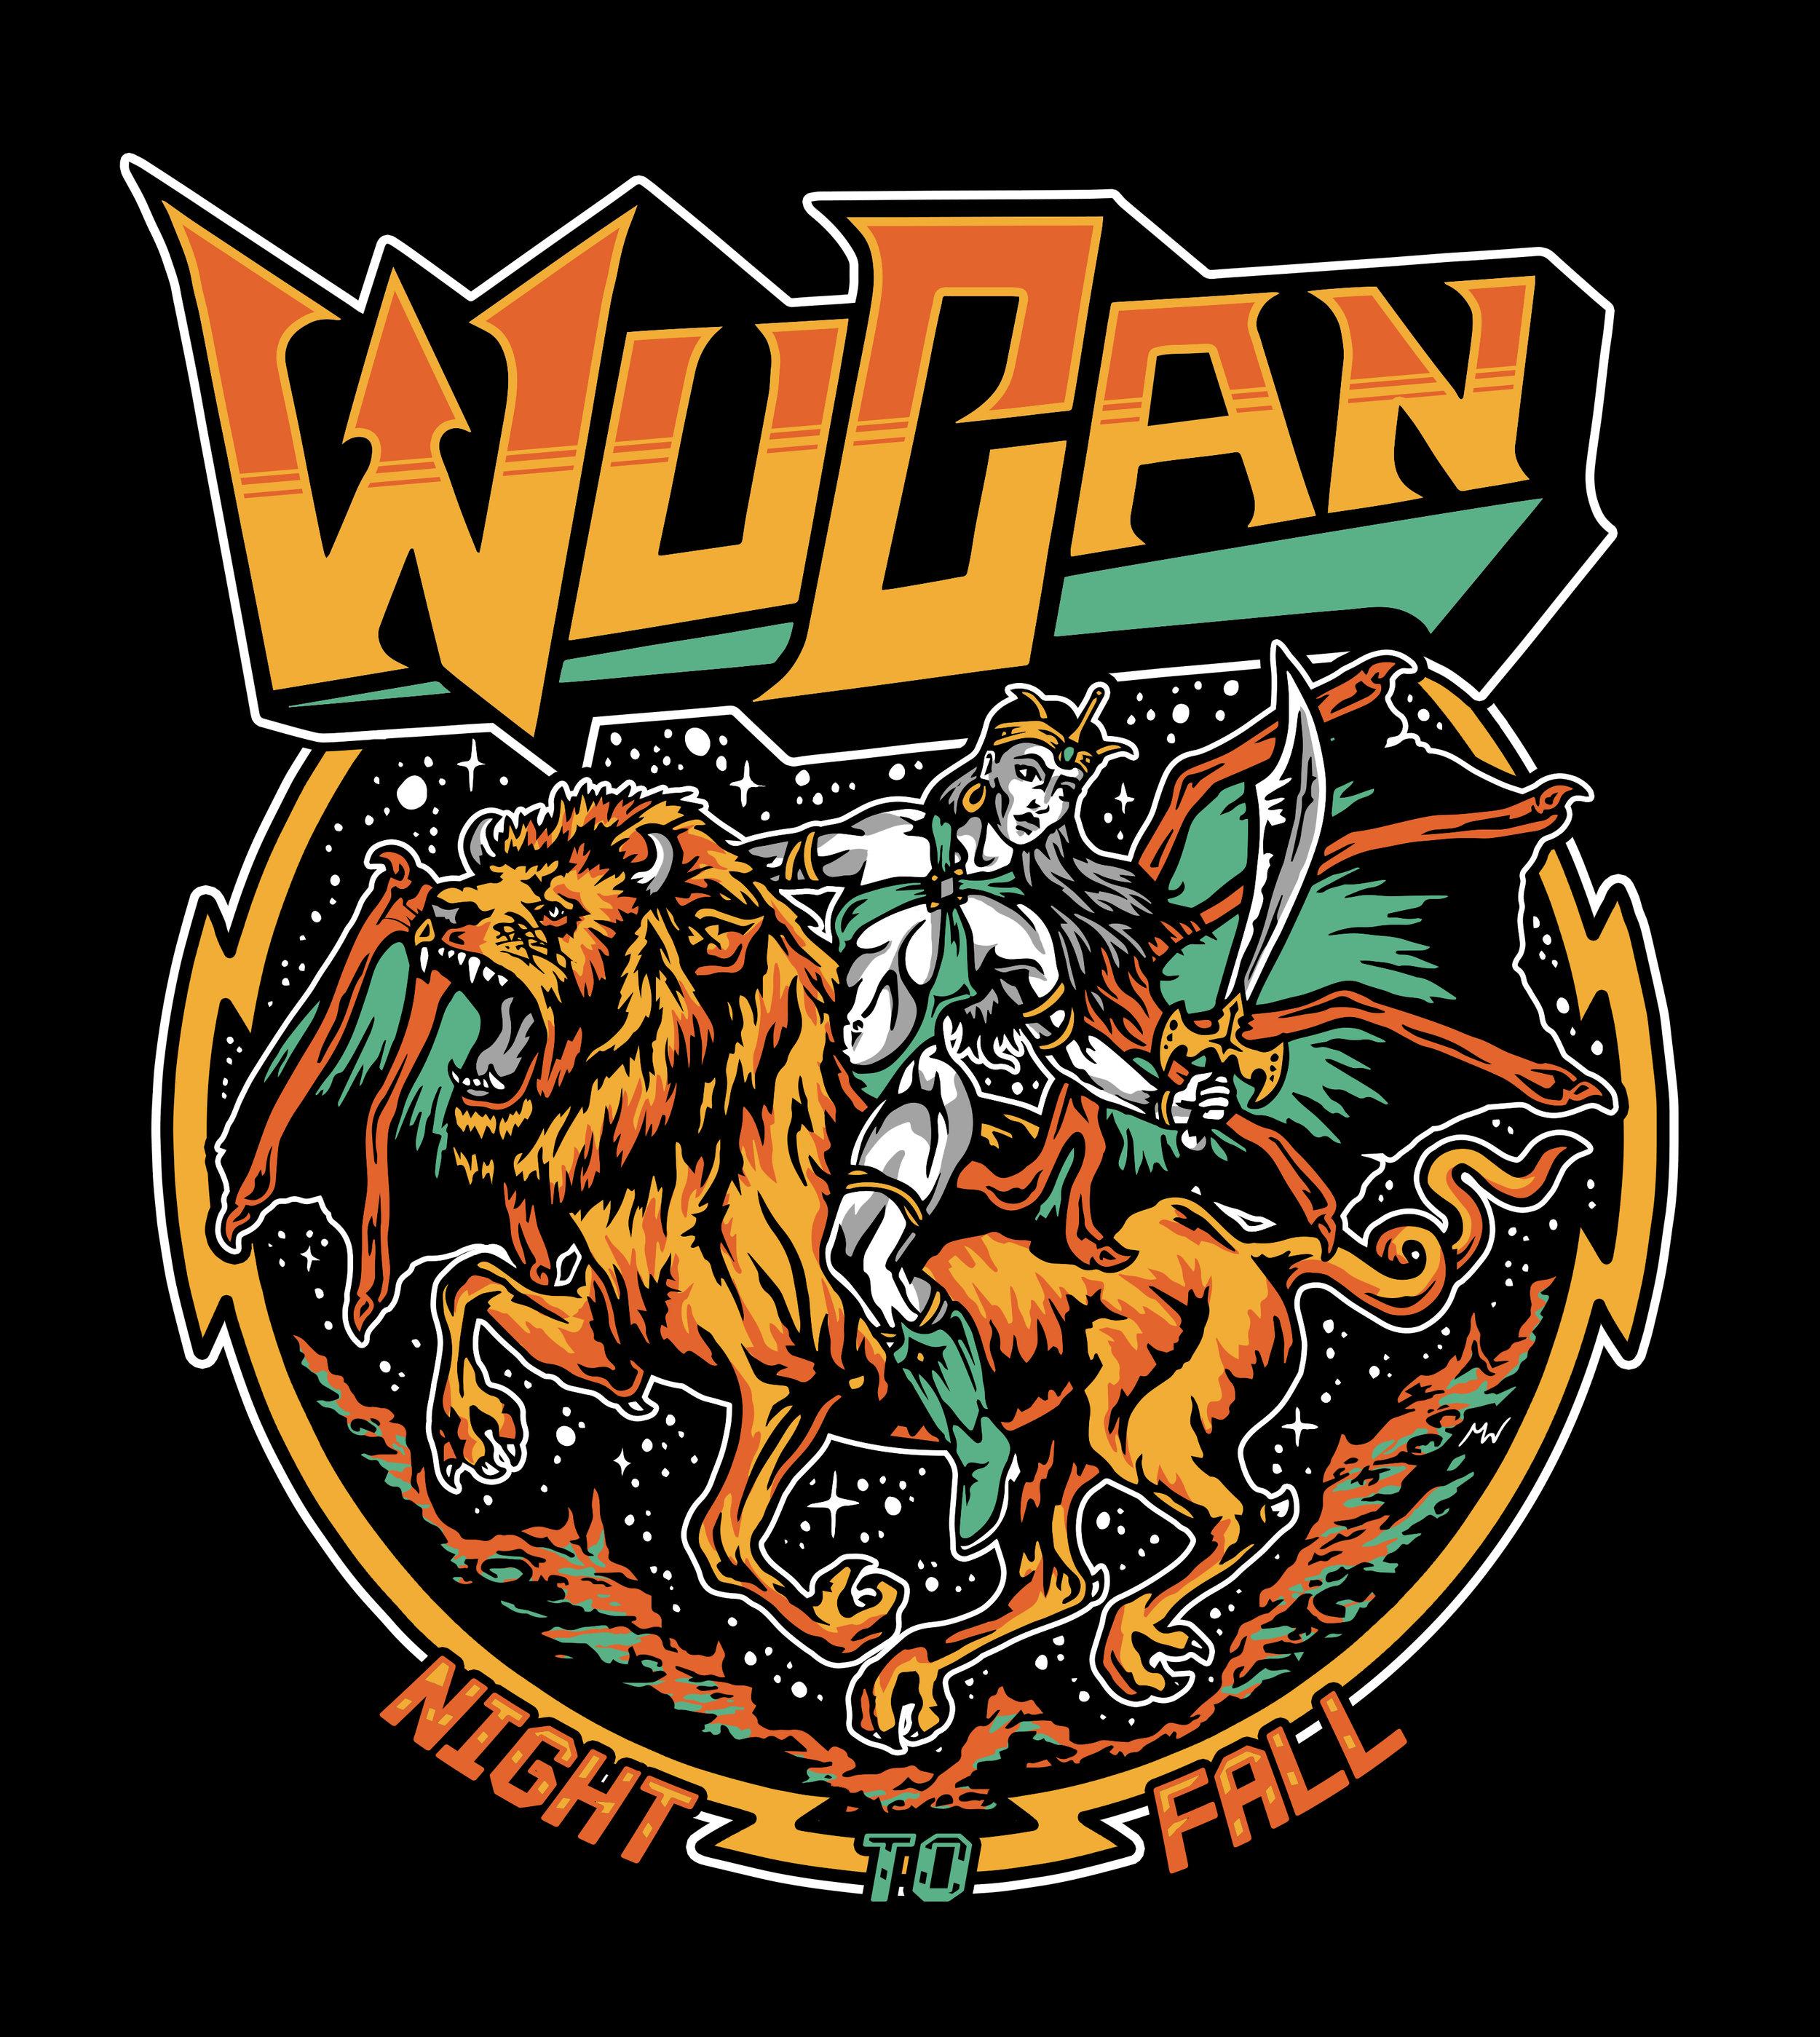 Wucan front prev.jpg